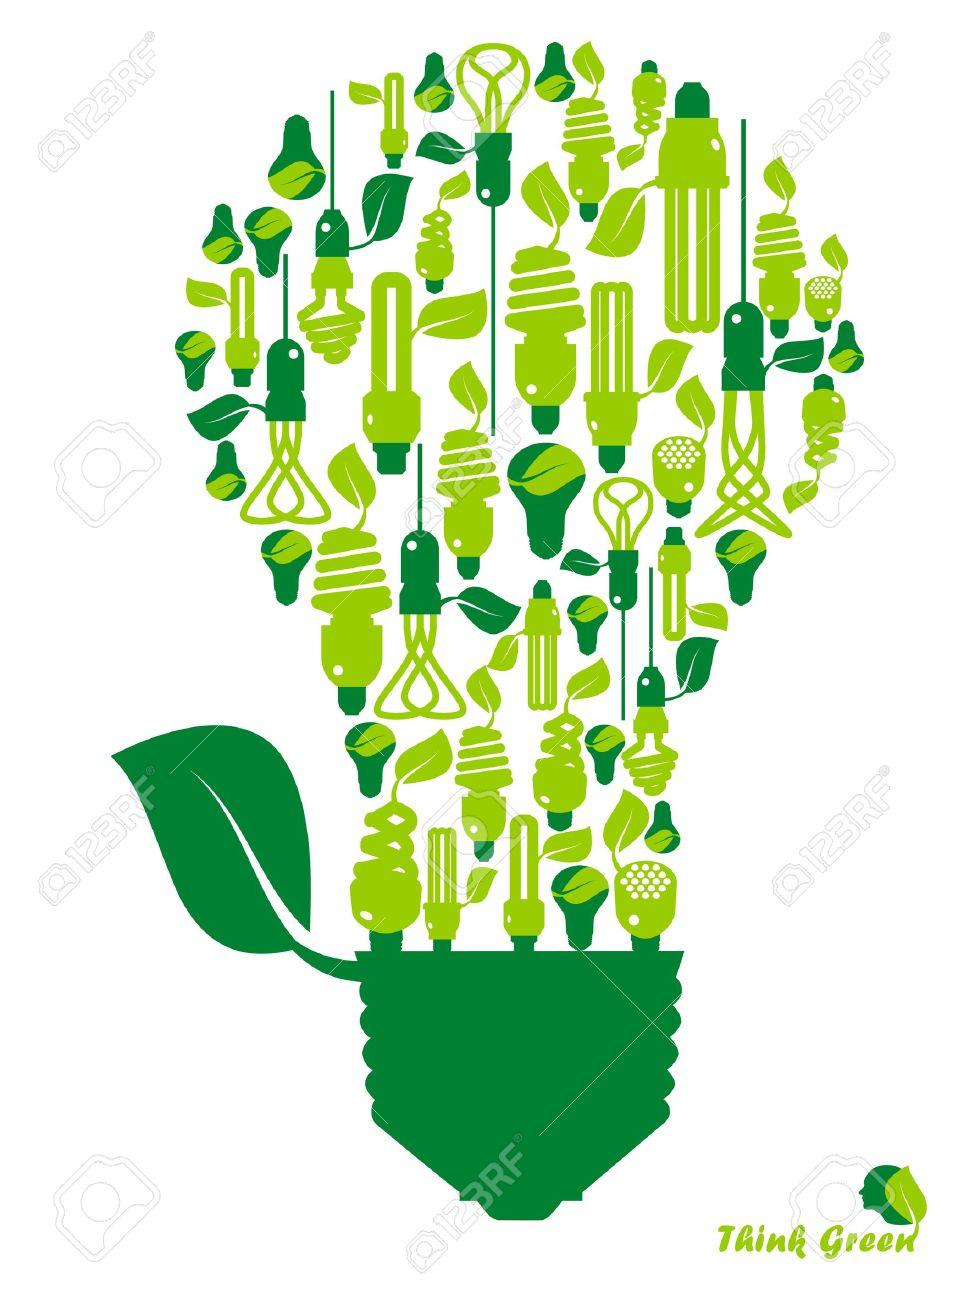 ecology, energy, environment, green grow, growth, icon Stock Vector - 11217244